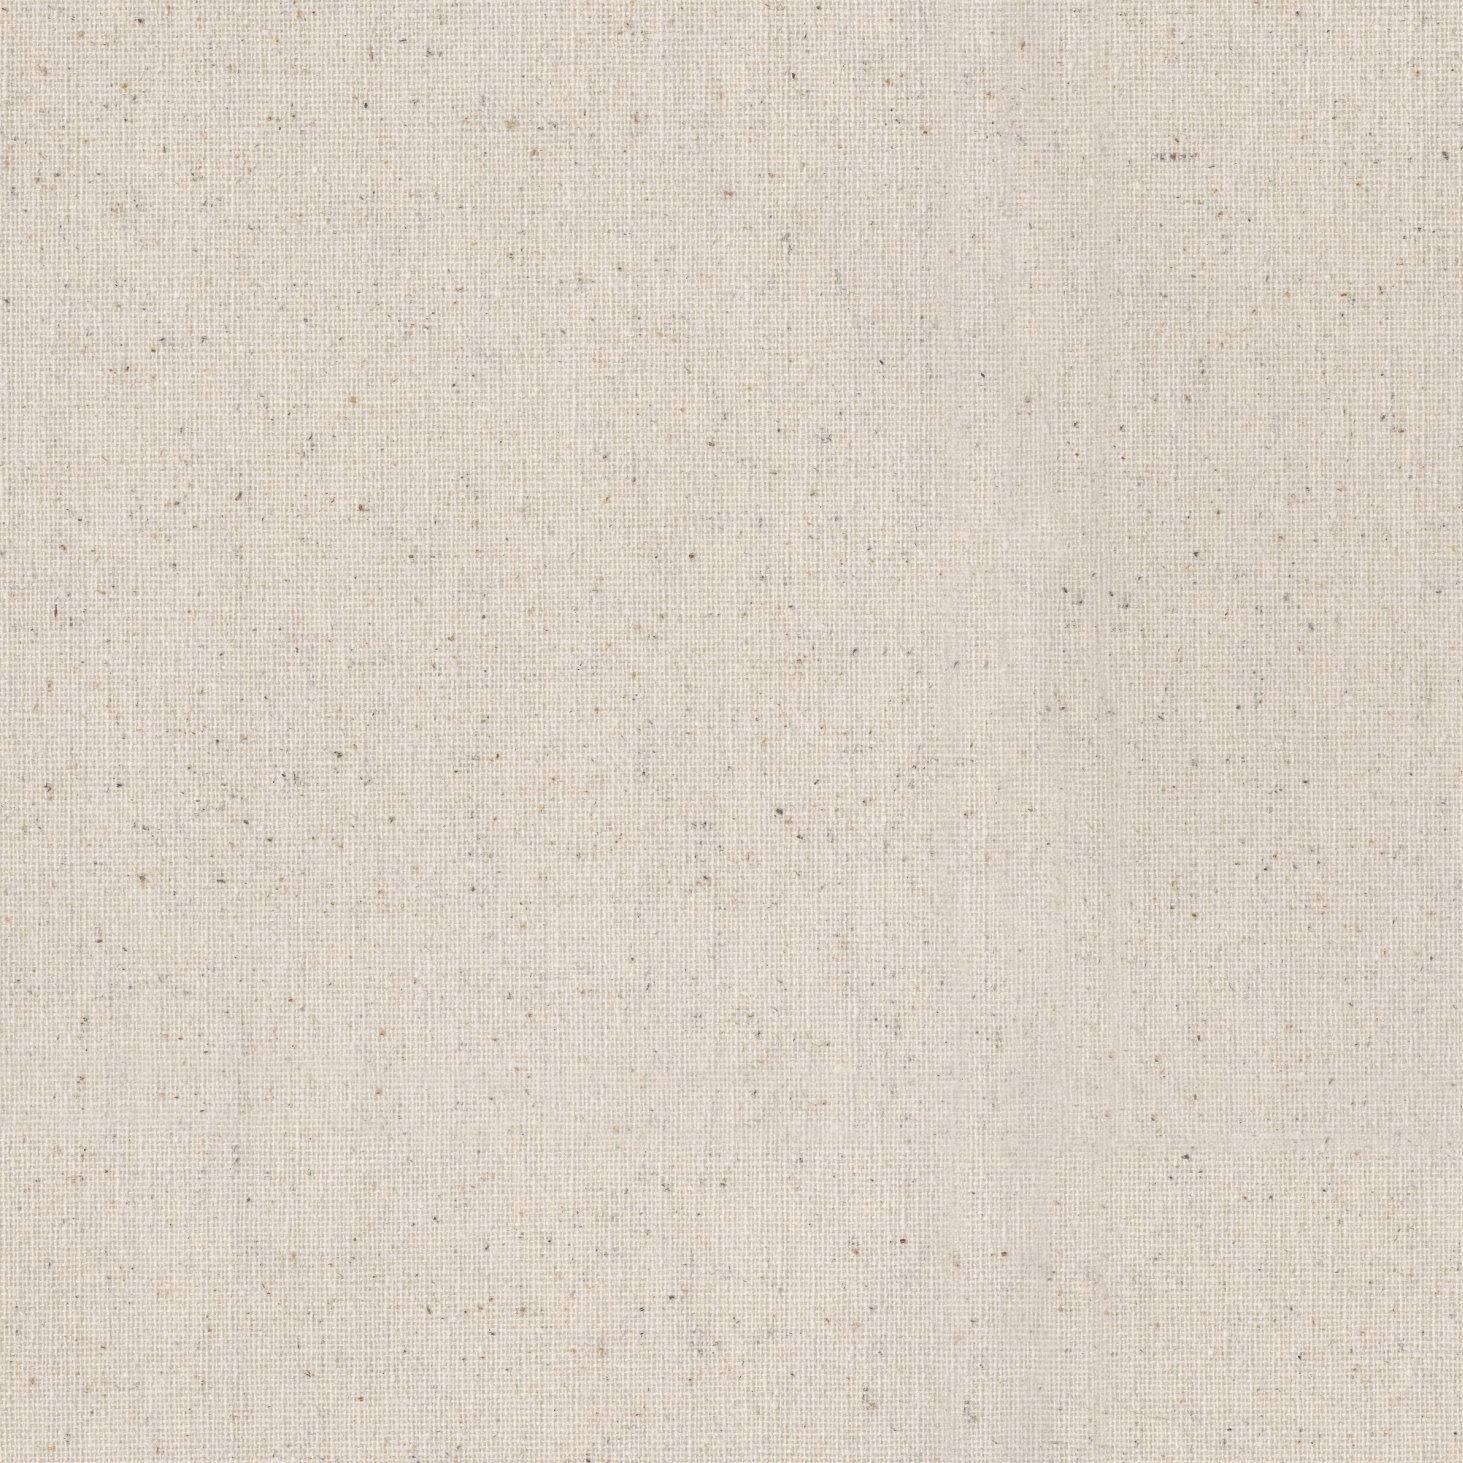 P3-485 Osanburg 100% cotton